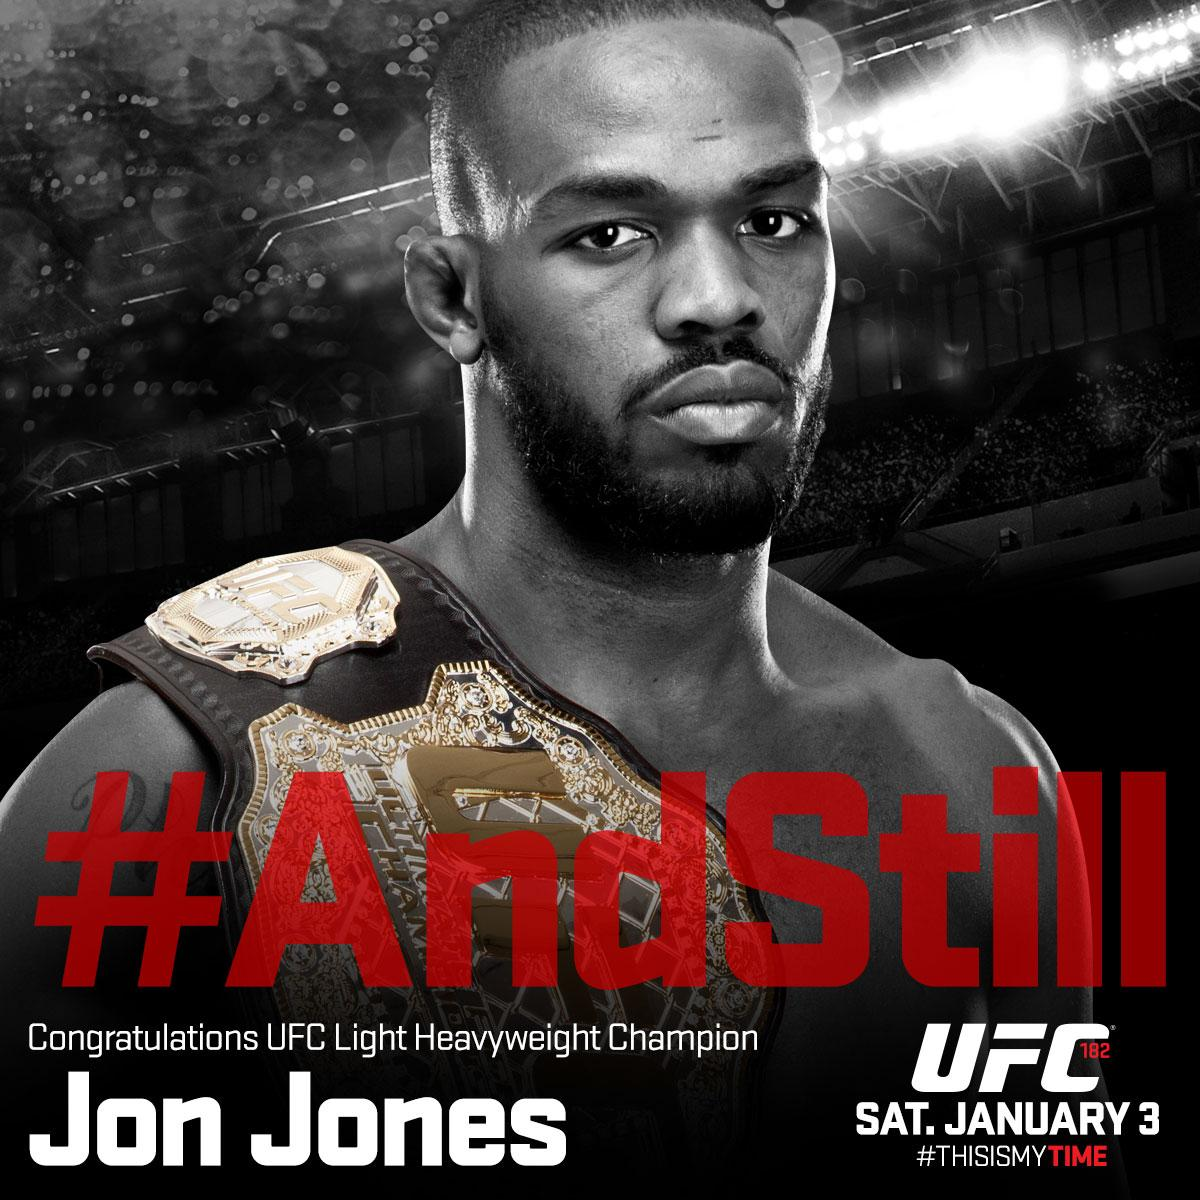 RT @ufc: #AndStill the undisputed UFC light-heavyweight champion of the world...@JonnyBones! #UFC182 http://t.co/oGd4vfswDw